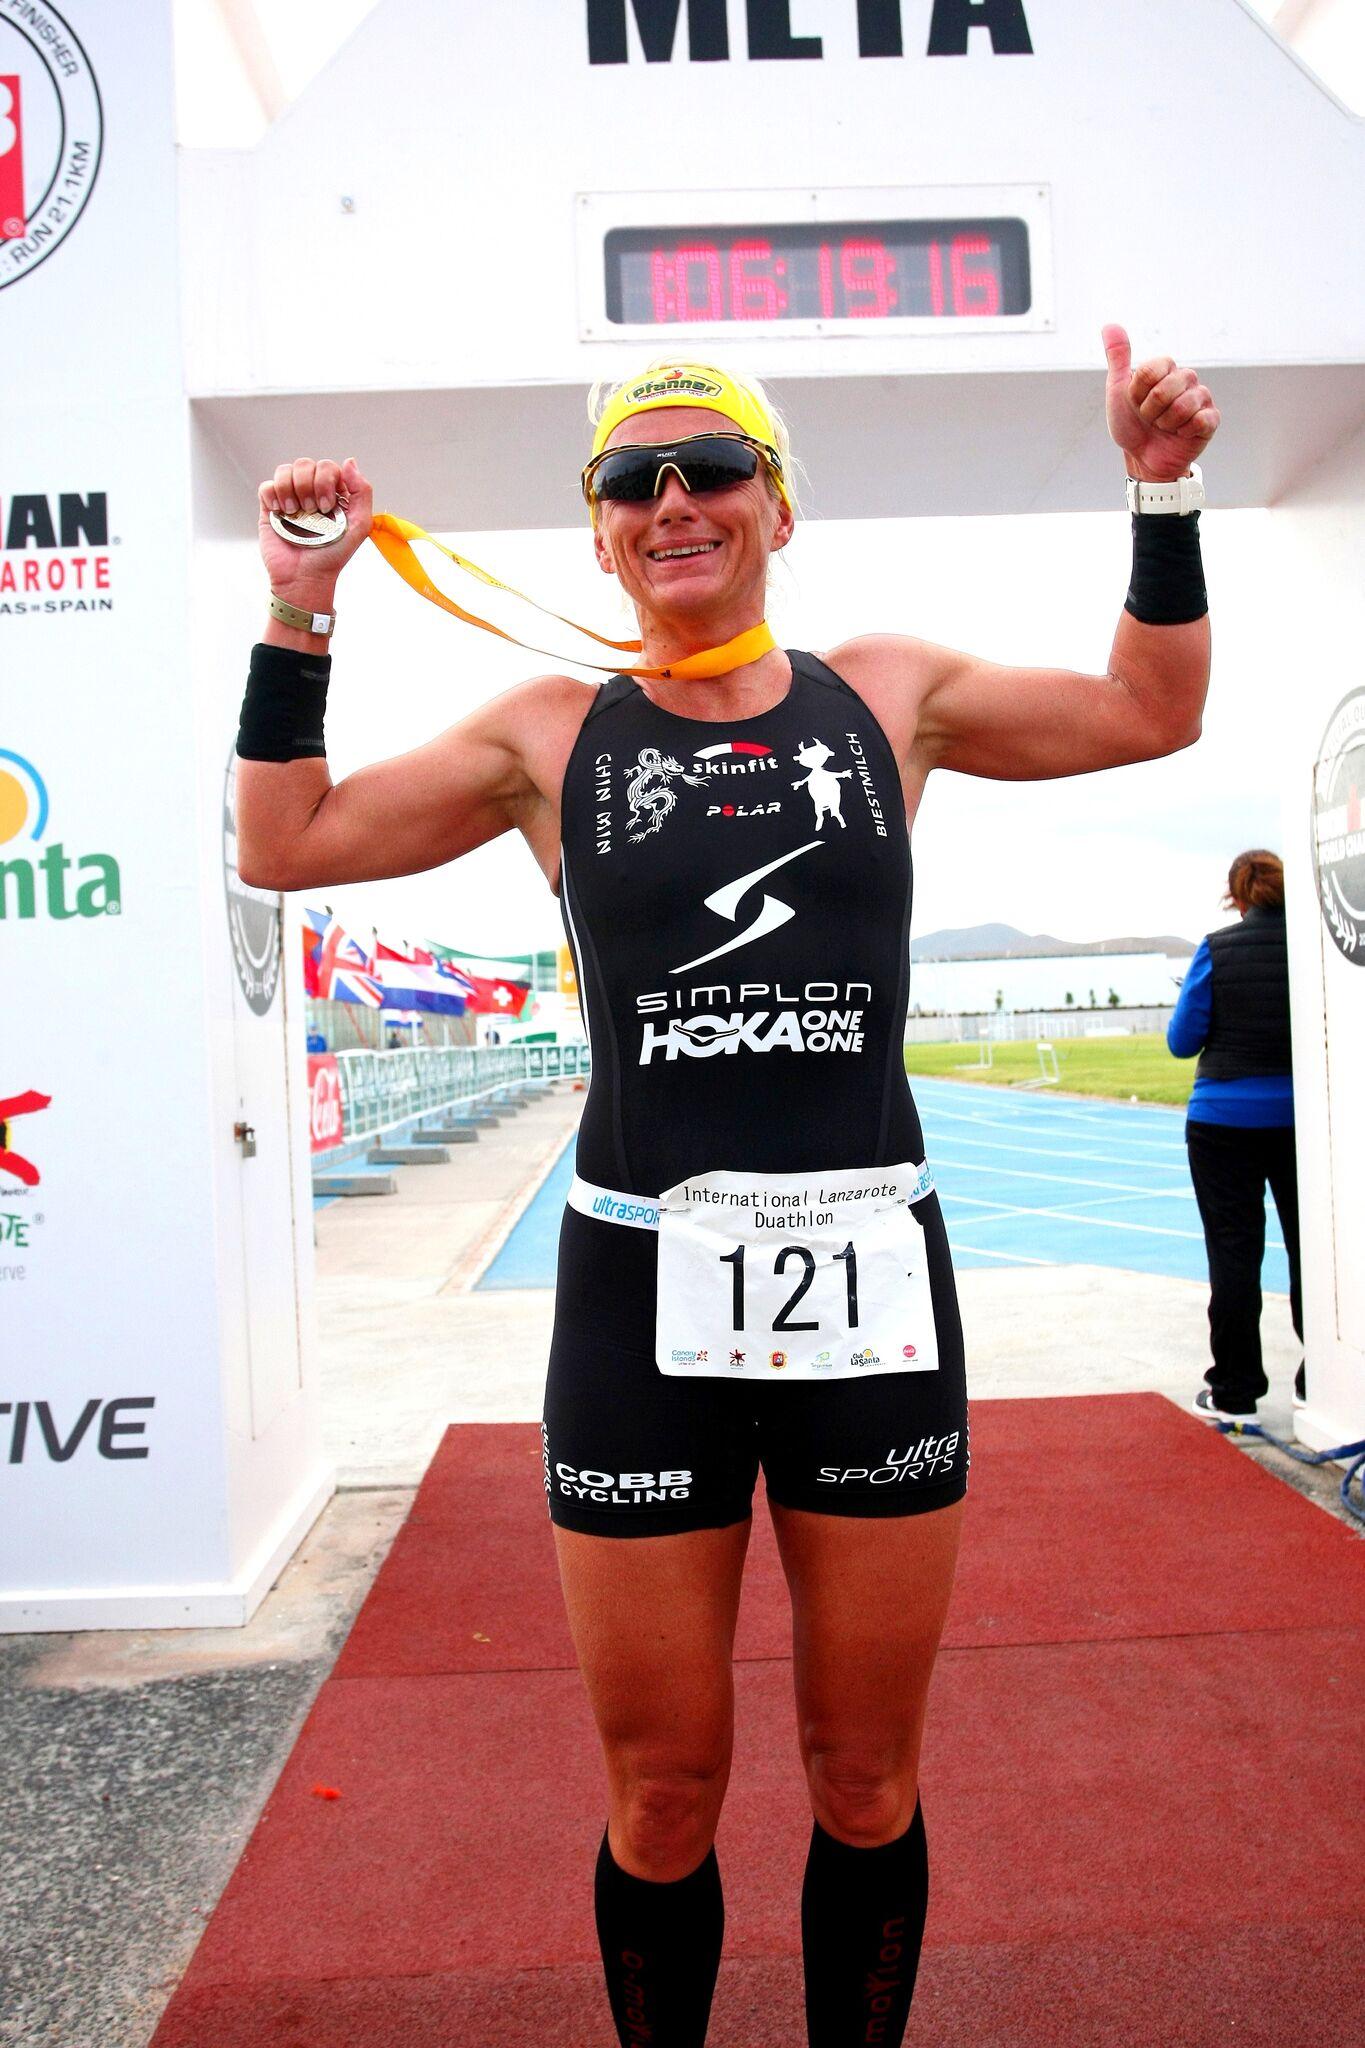 Yvonne van Vlerken_Int. Lanzarote Duathlon 2017